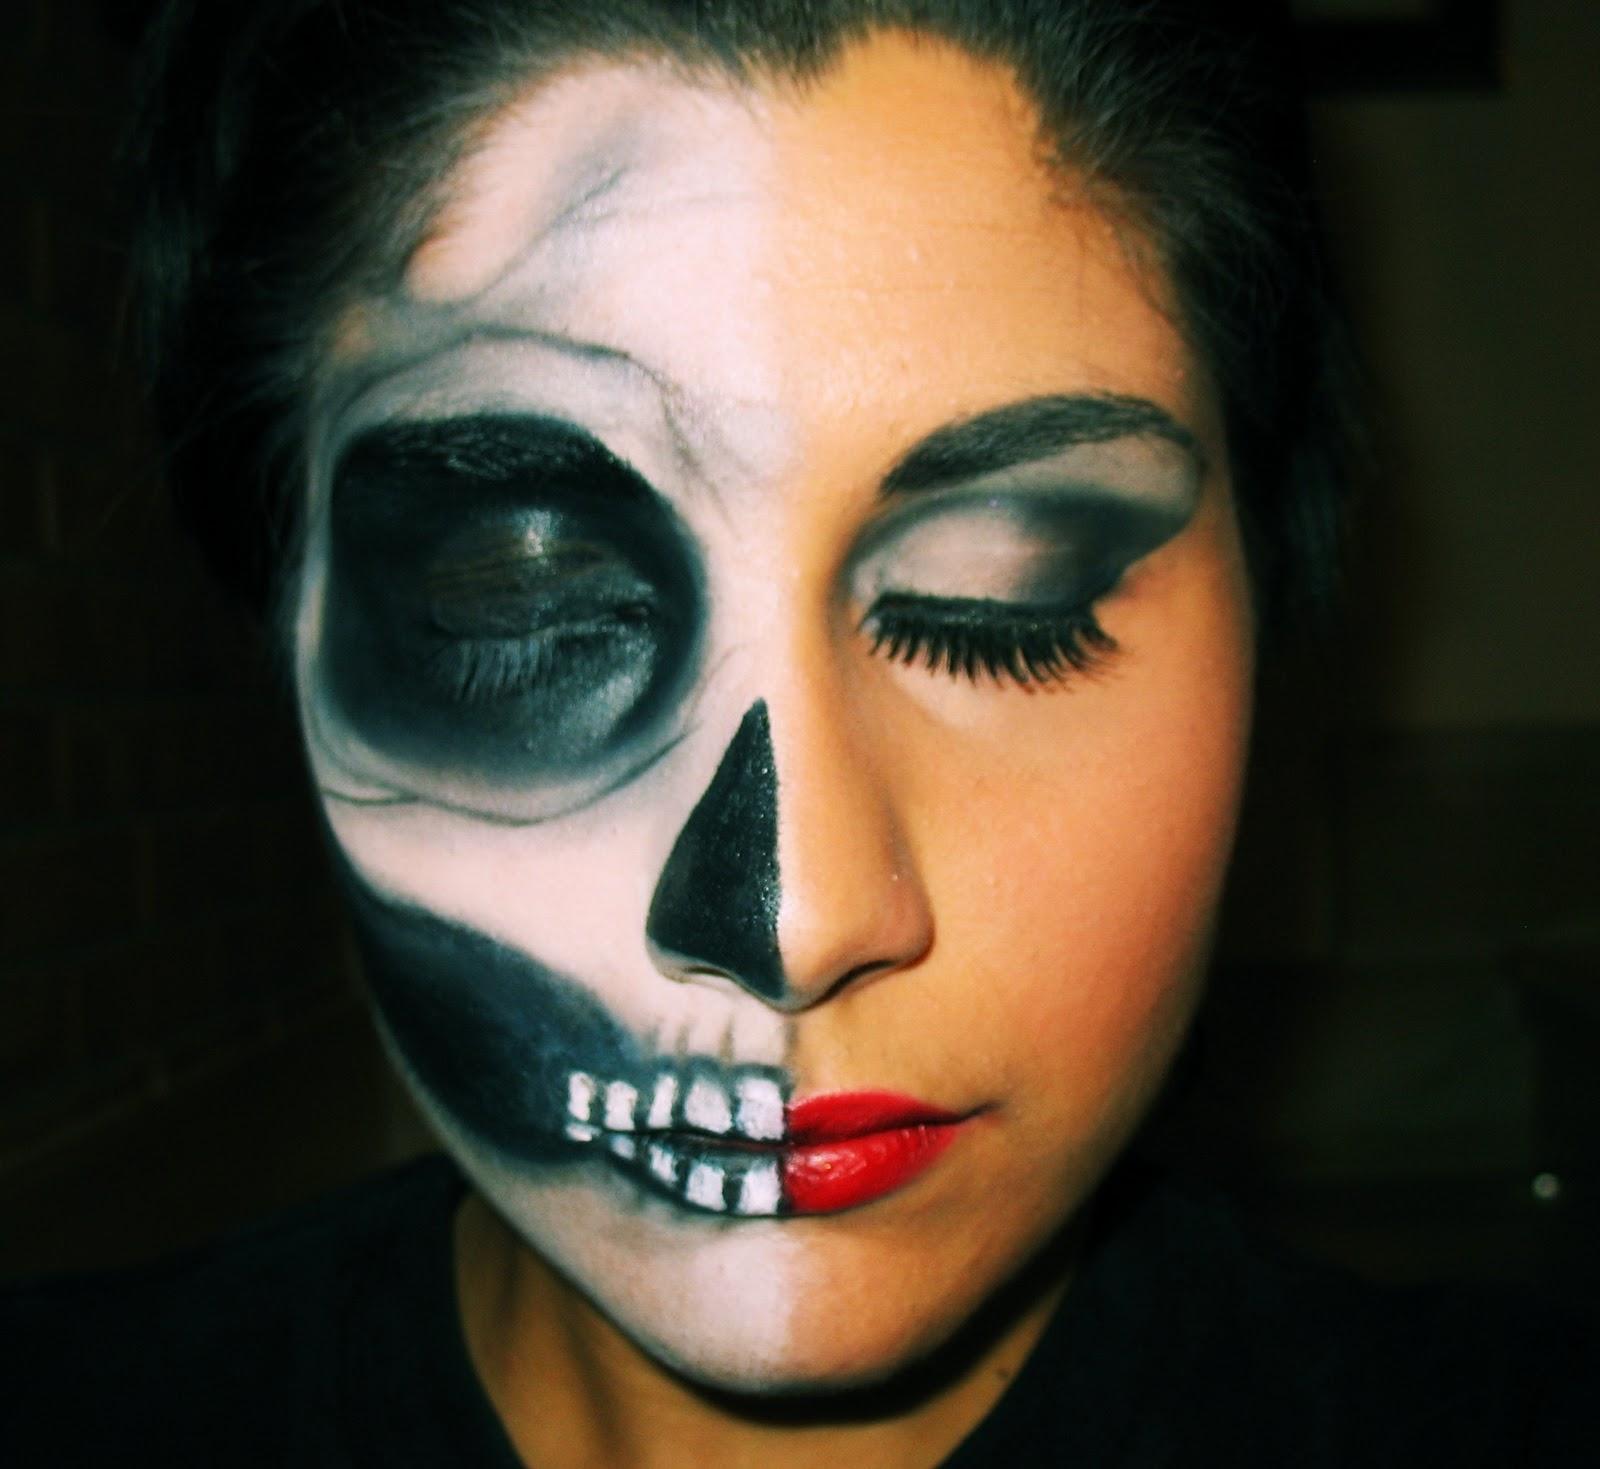 Top Cecily makeup: Make up - Half Skull - Halloween 2011 KL03